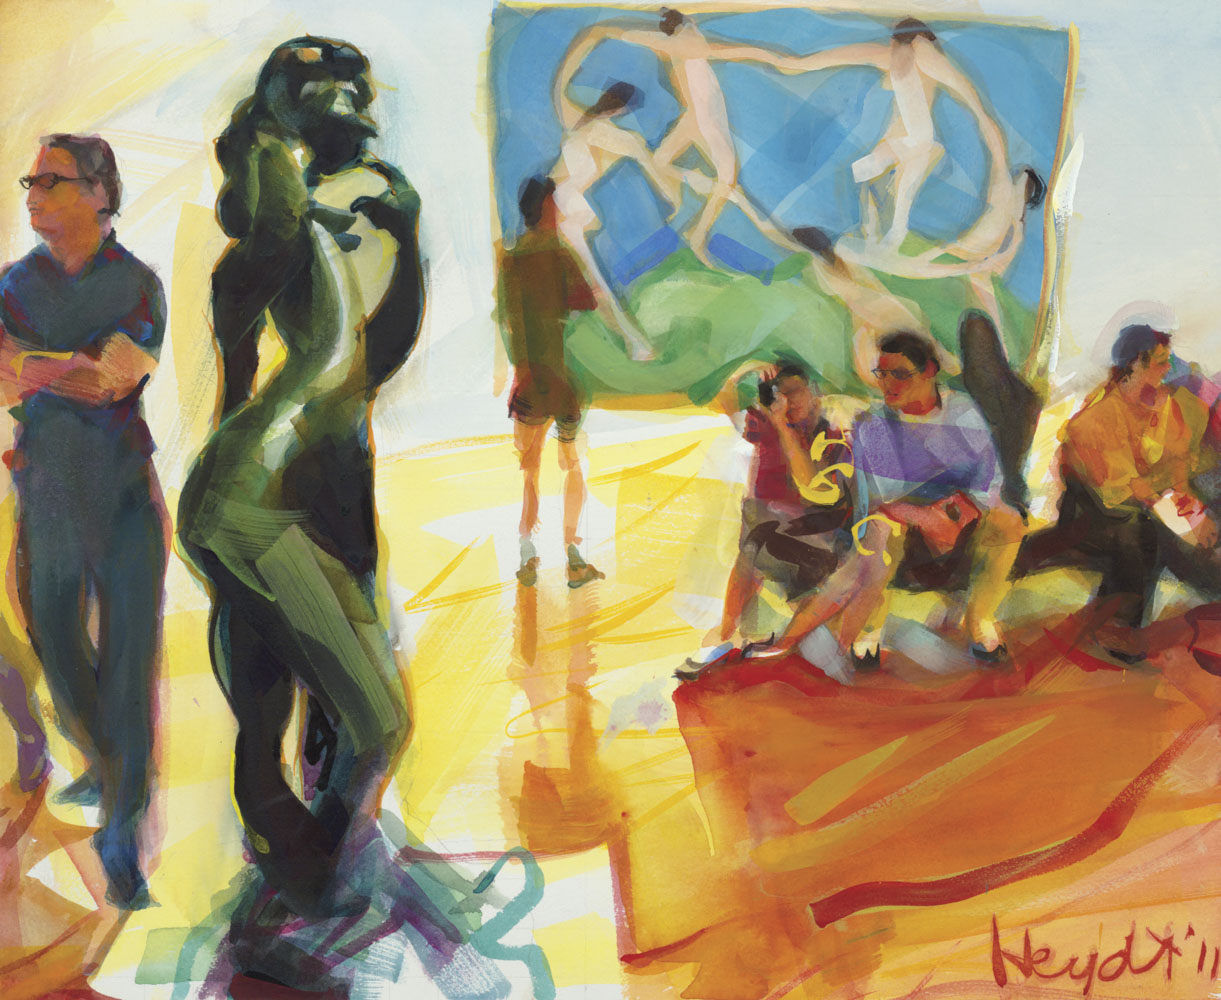 The Matisse room at the Metropolitan Museum, New York City